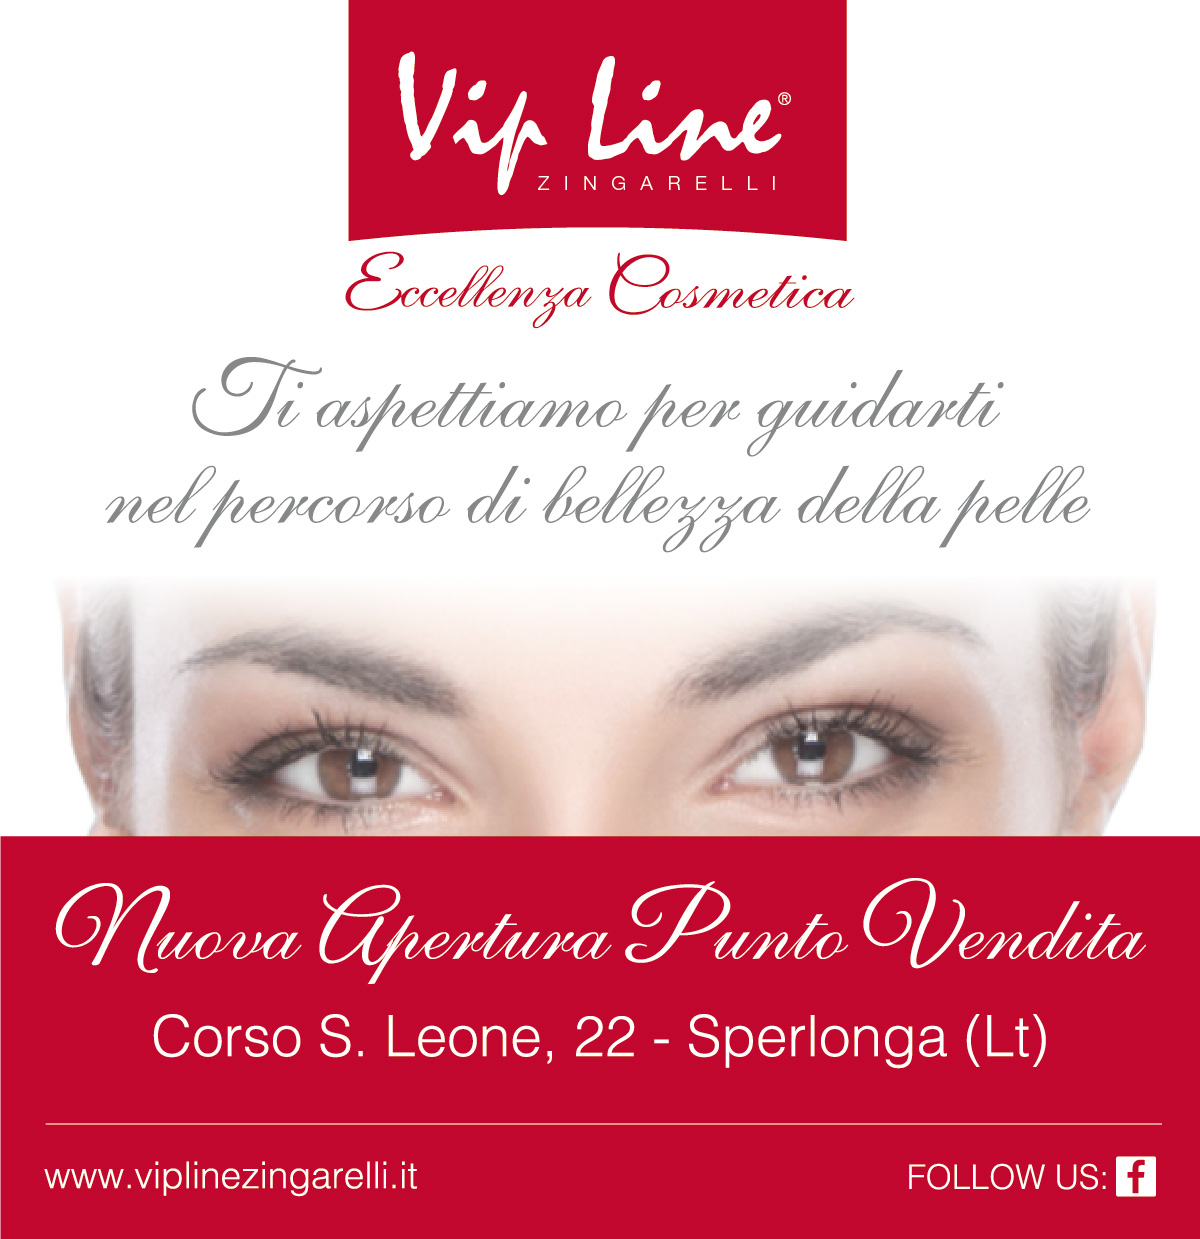 VIP-LINE-APERTURA-PUNTO-VENDITA